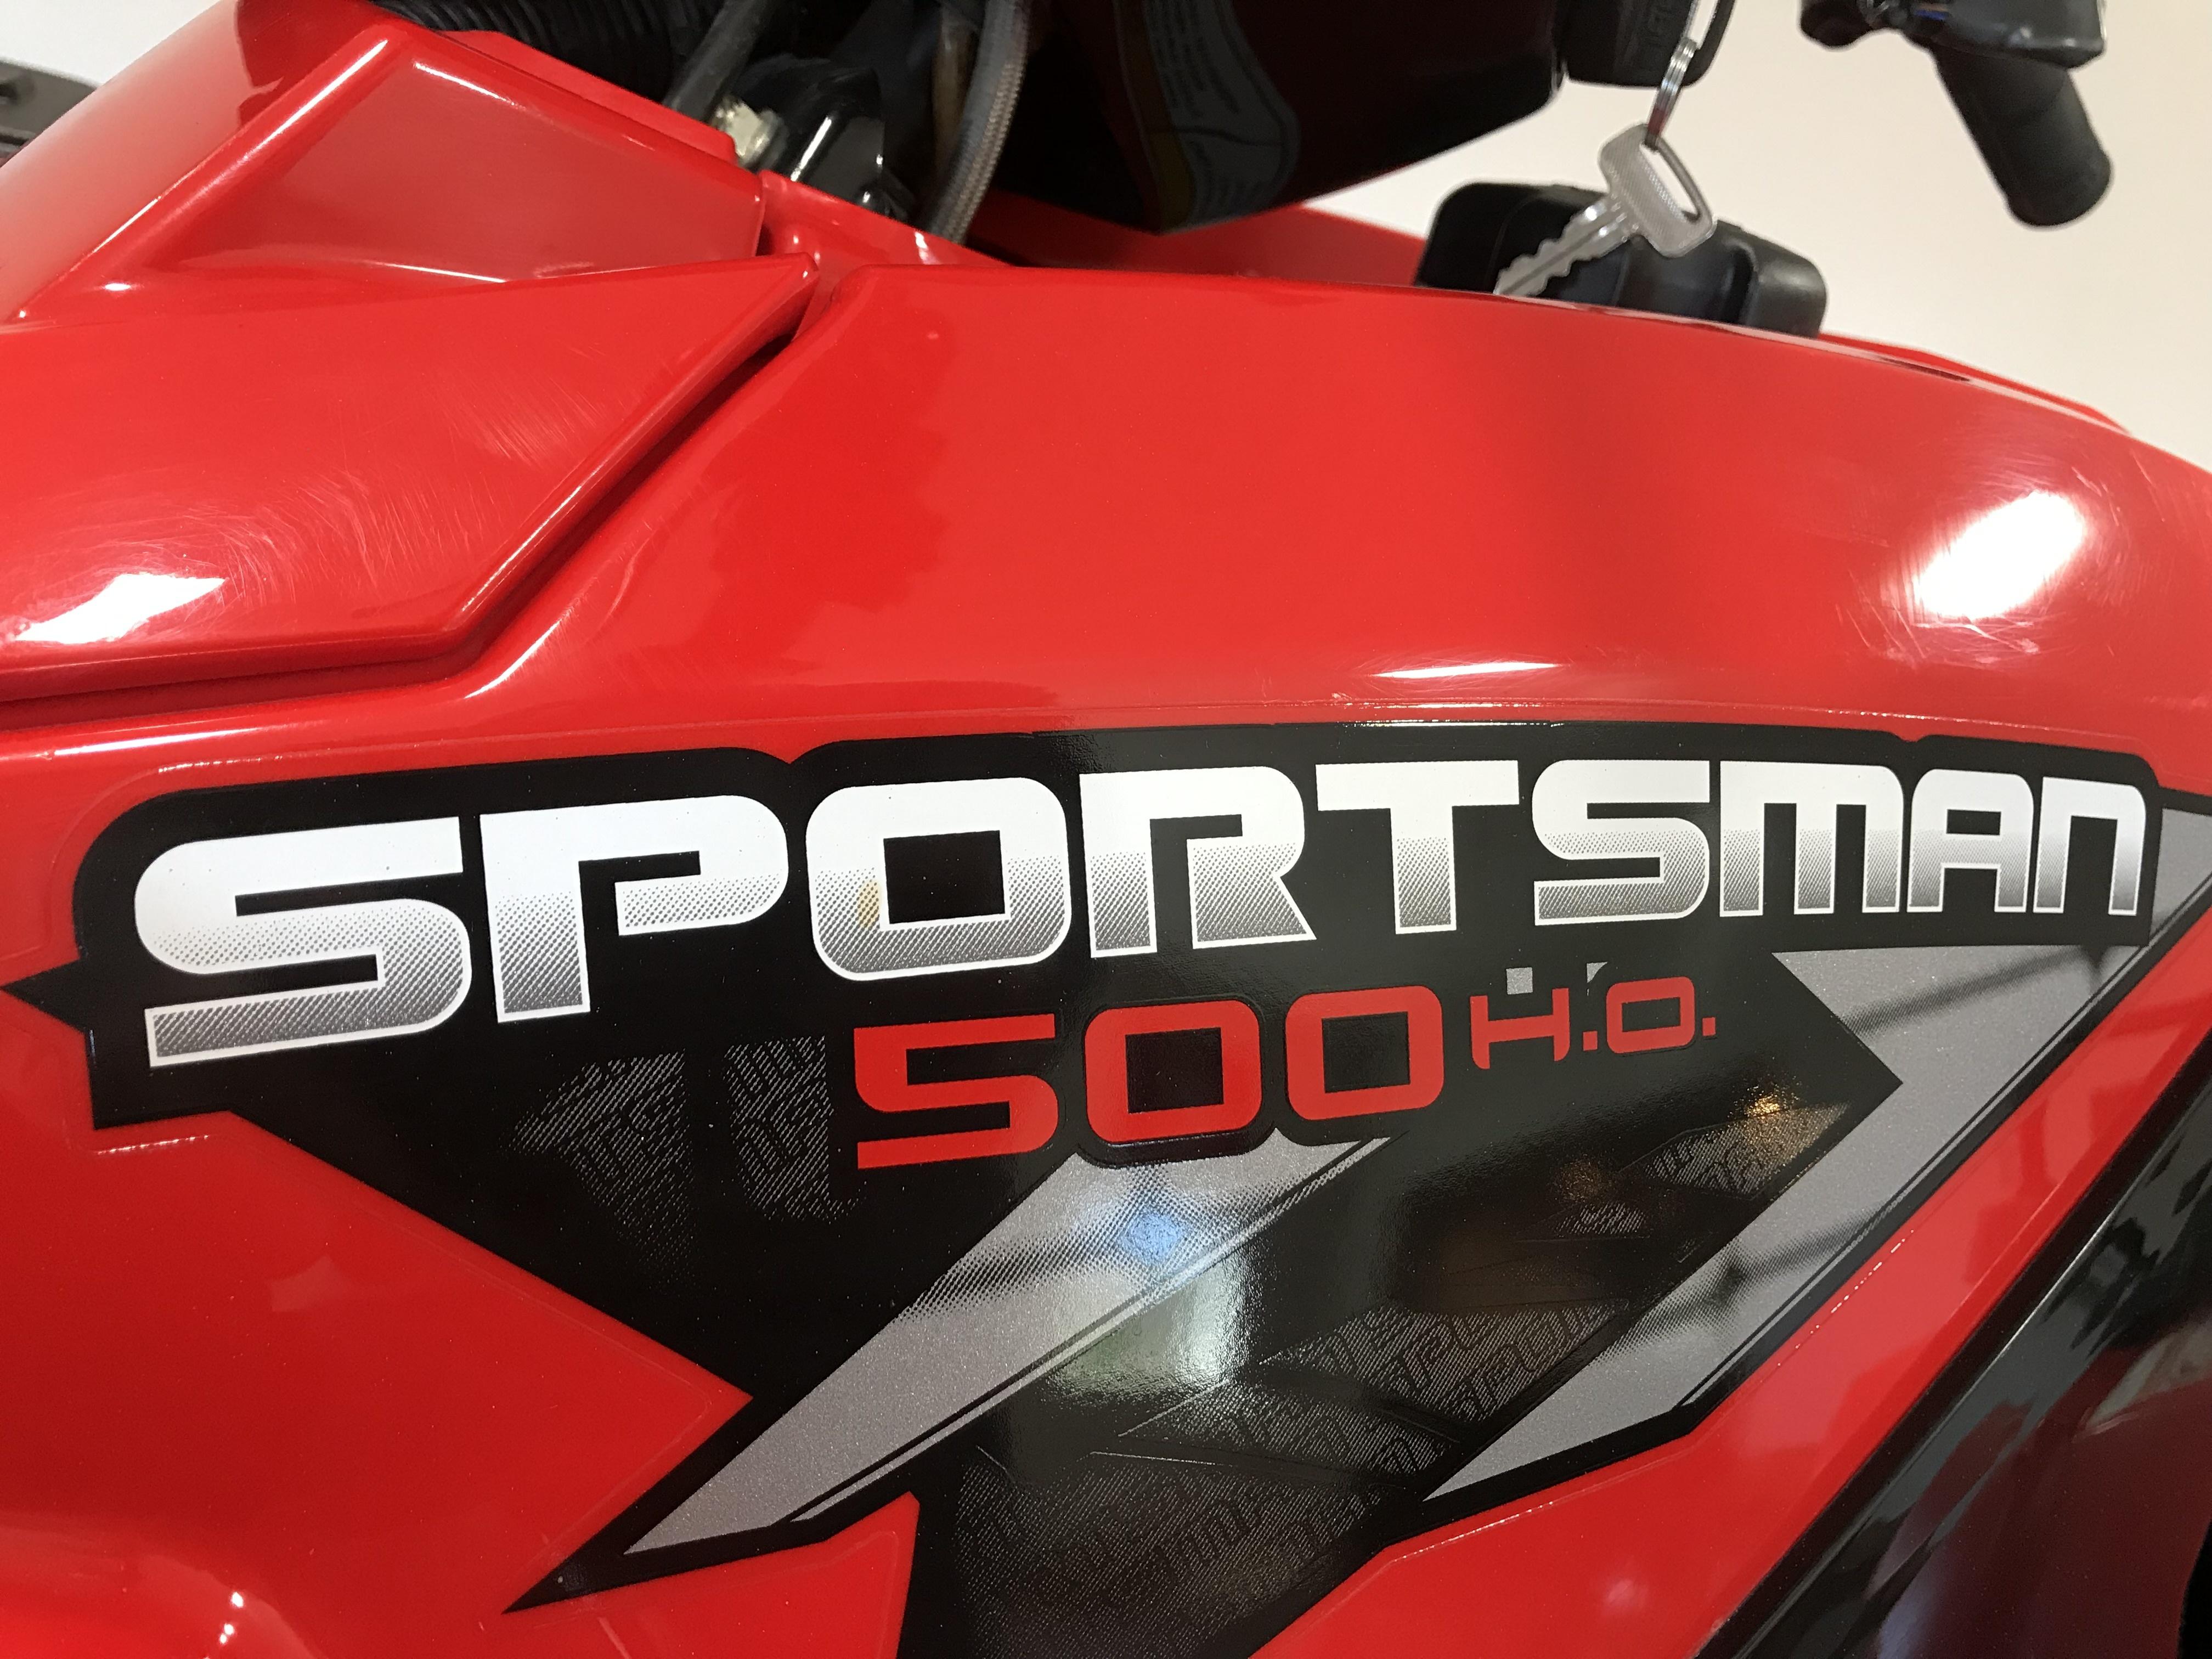 2010 Polaris Sportsman 500